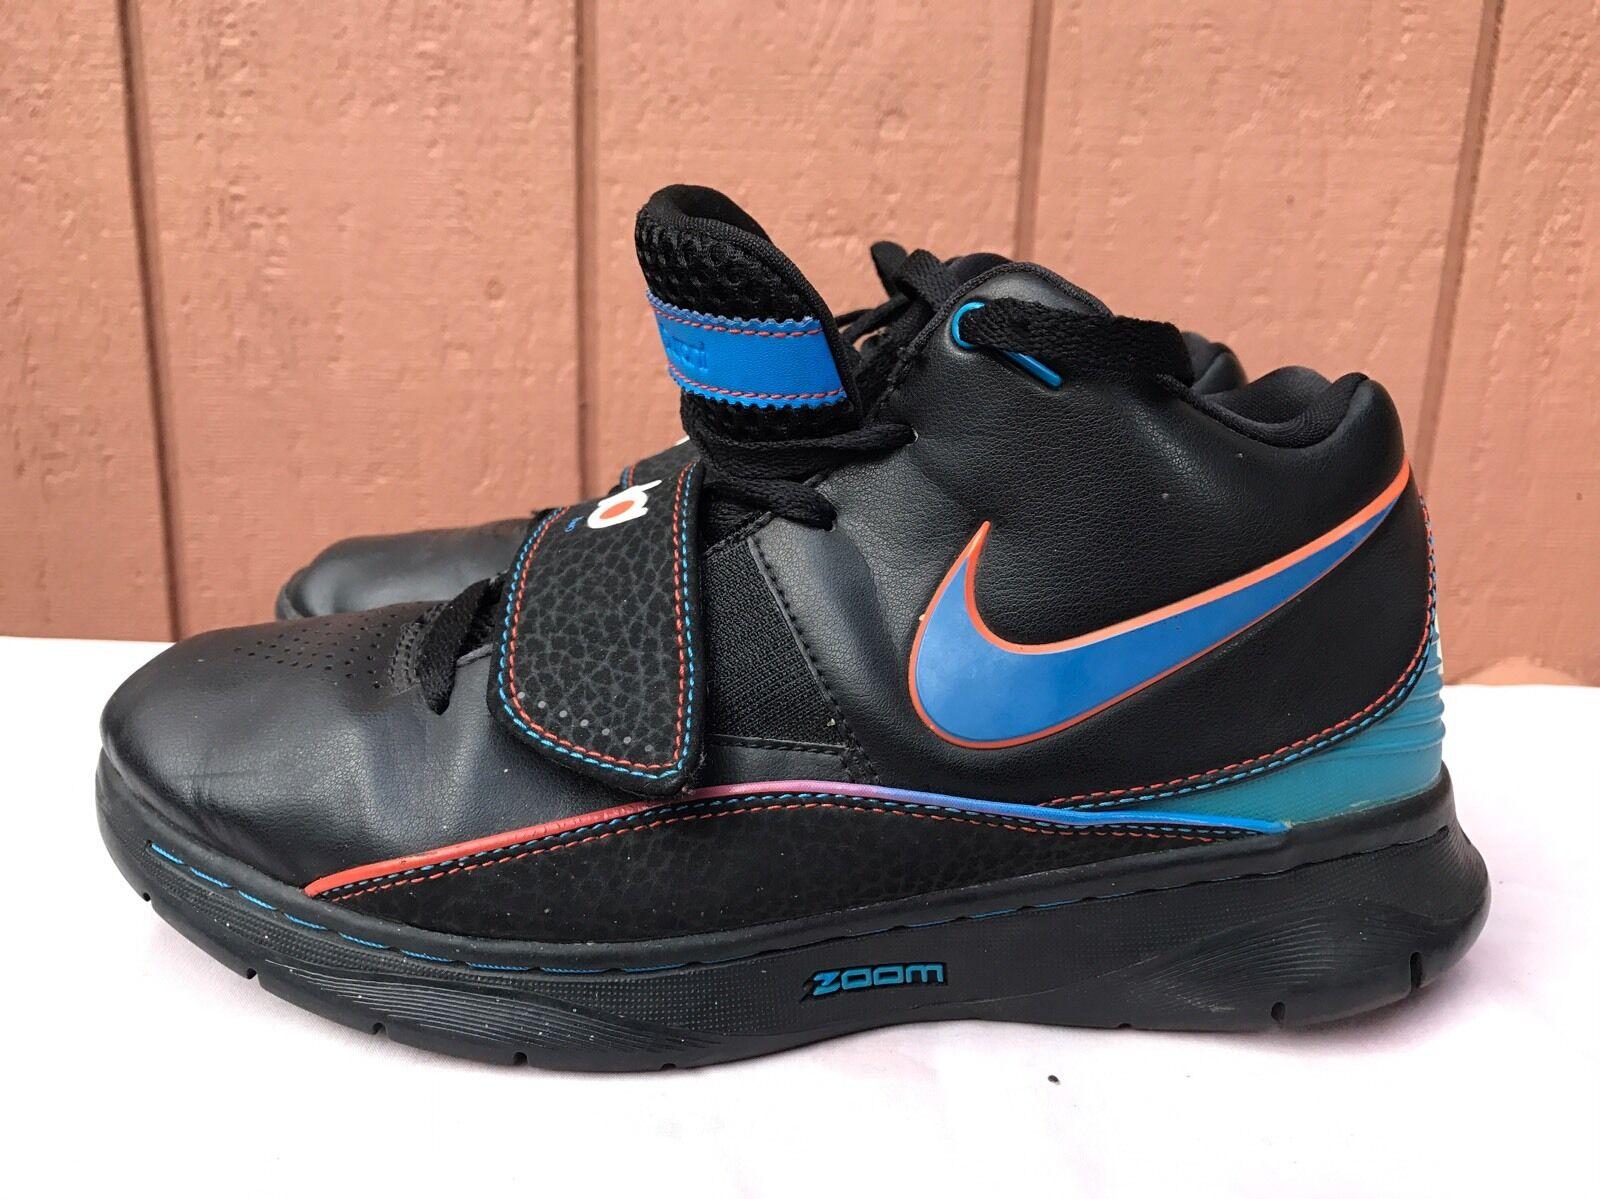 EUC NIKE KD II 2 KEVIN DURANT BLACK-PHOTO BLUE-TEAM ORANGE US 7.5 386423-041 Cheap women's shoes women's shoes